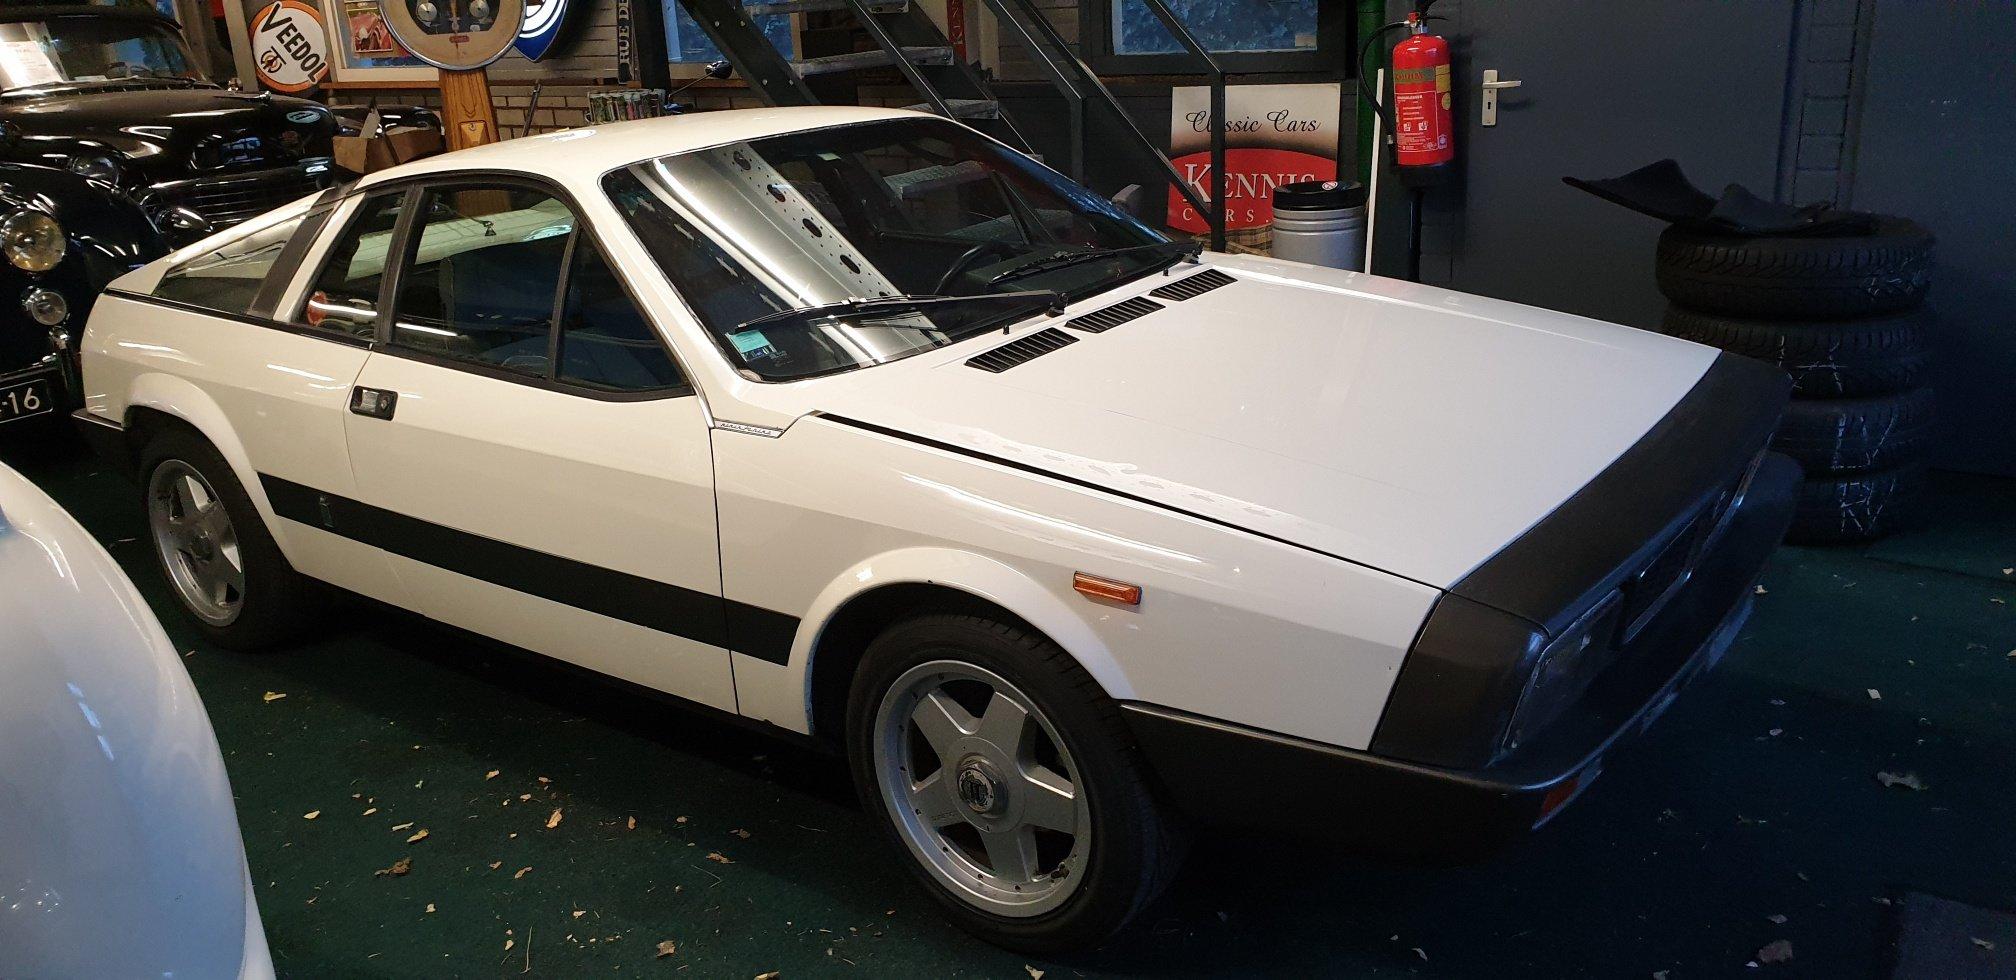 Lancia Beta Monte Carlo Coupe 1982 For Sale (picture 1 of 6)